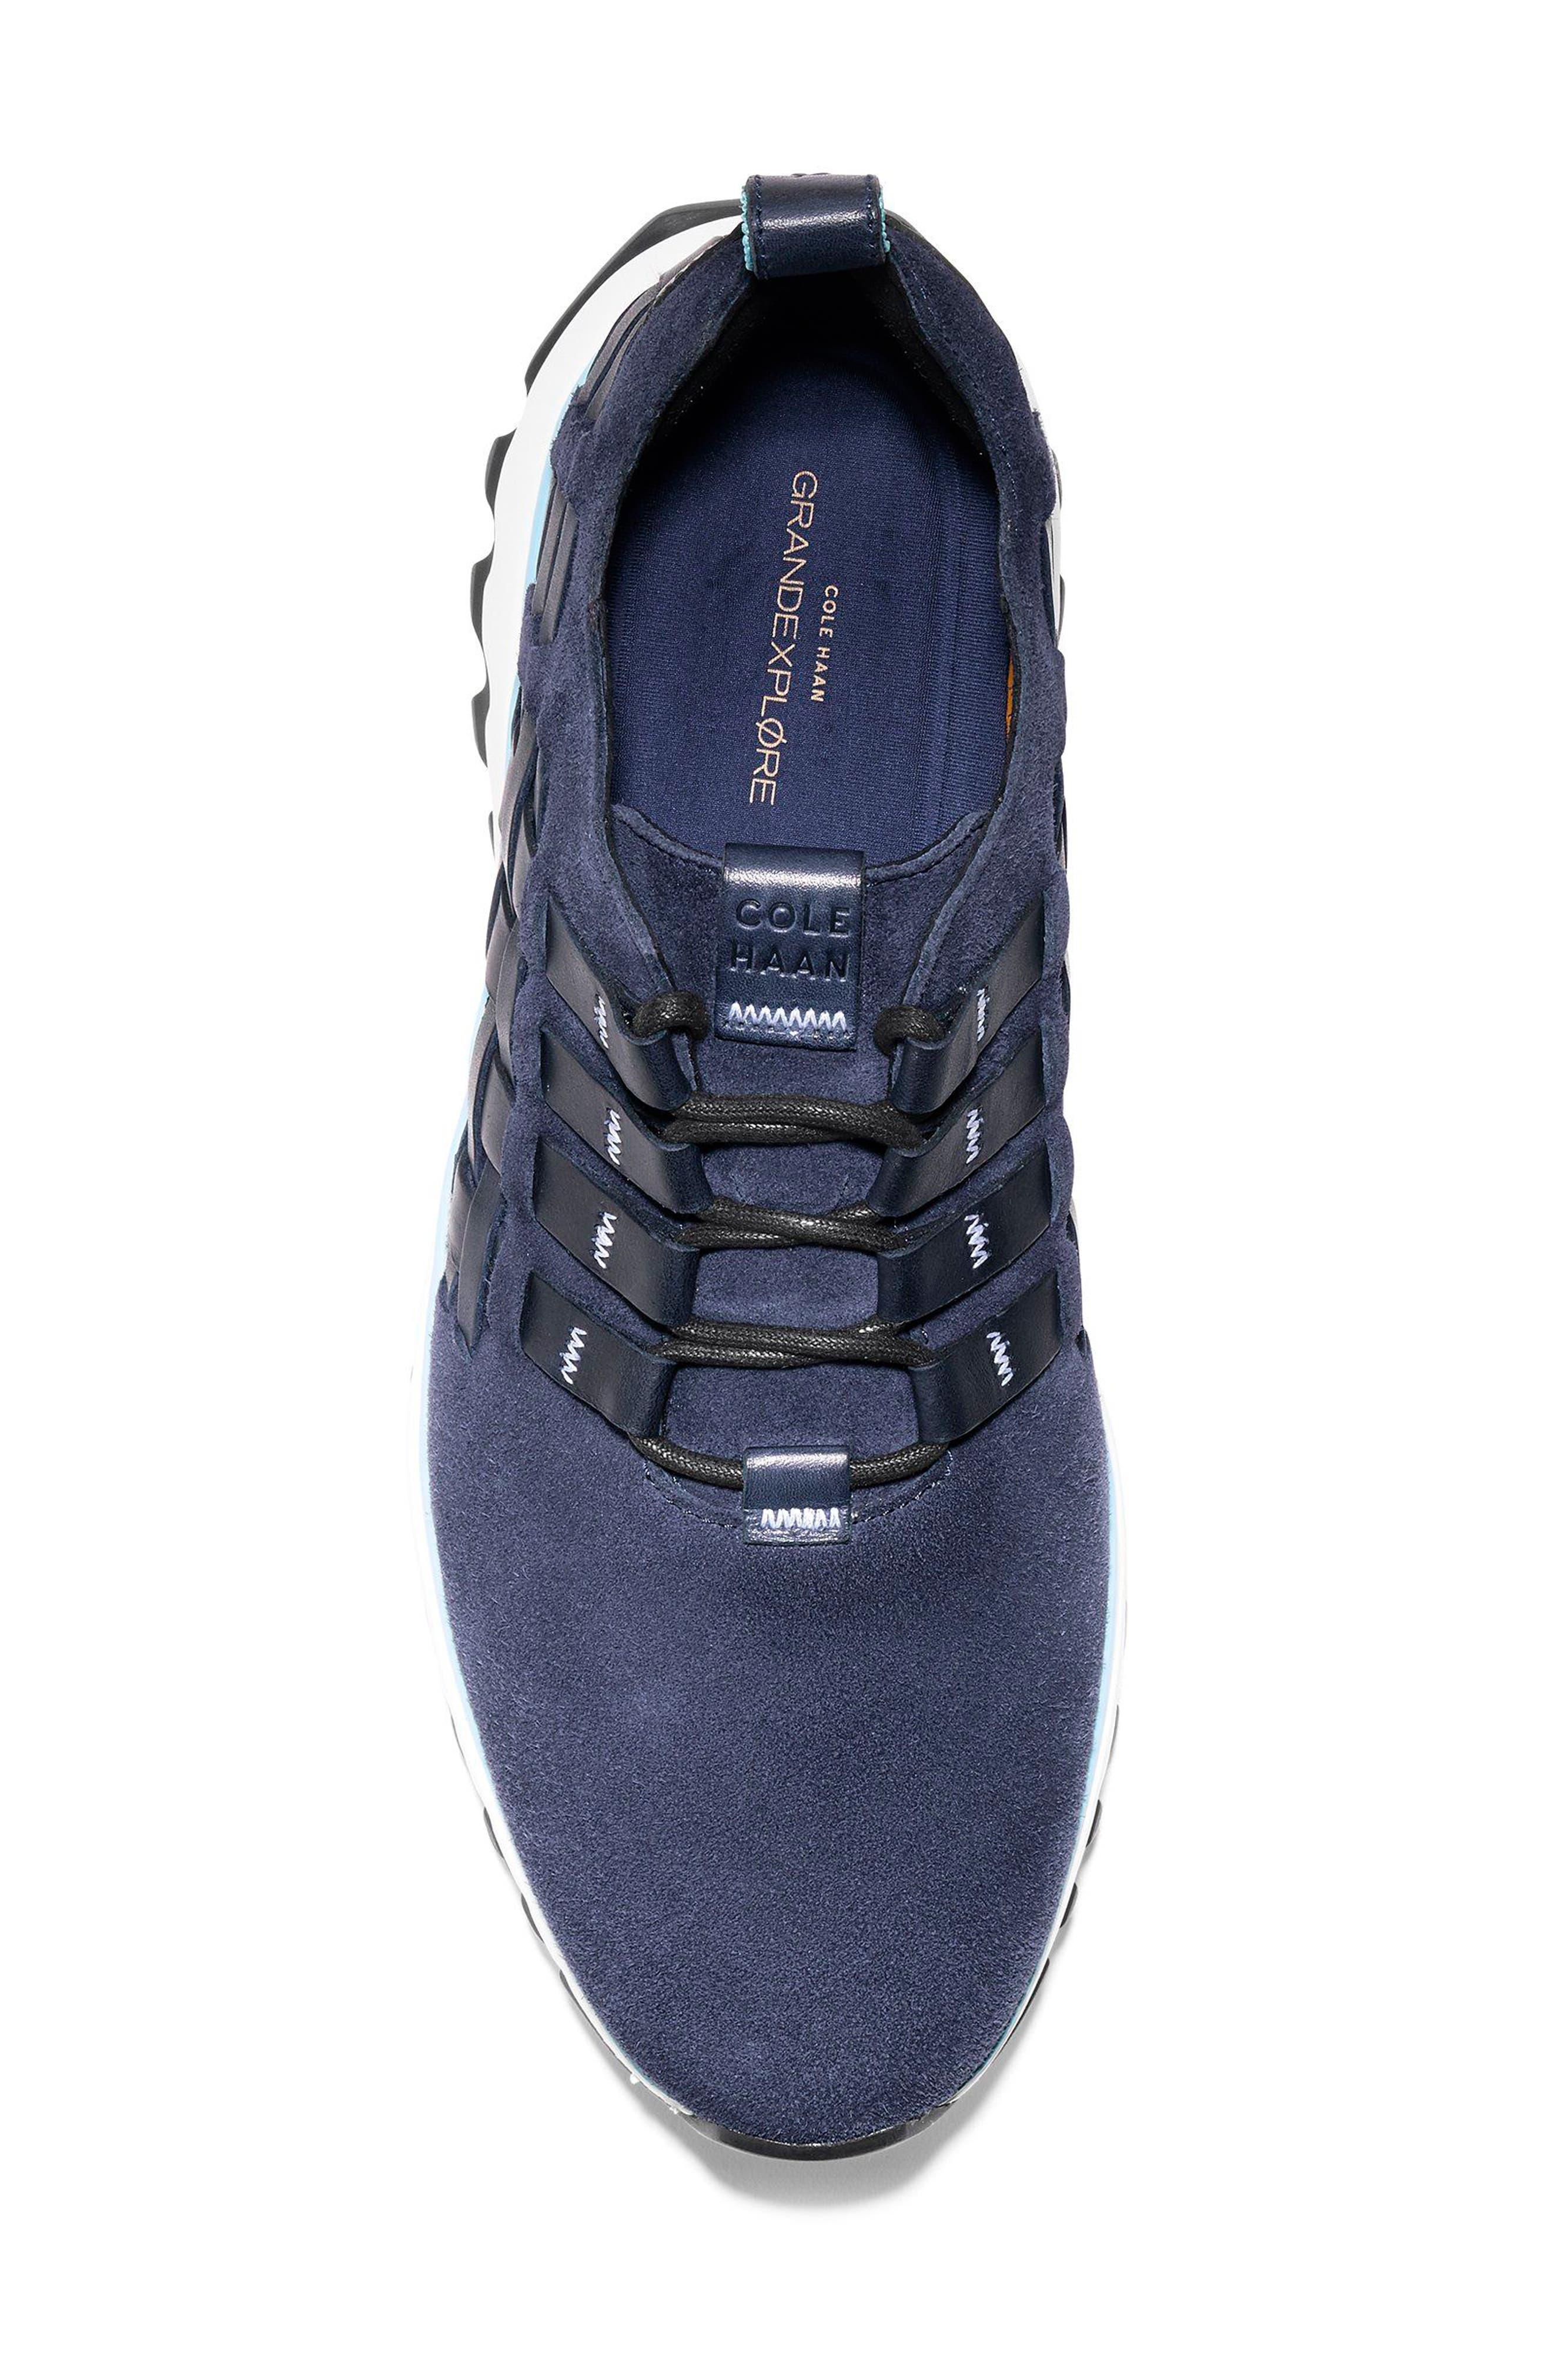 GrandExplore All Terrain Woven Sneaker,                             Alternate thumbnail 5, color,                             Marine Blue/Optic White/Black